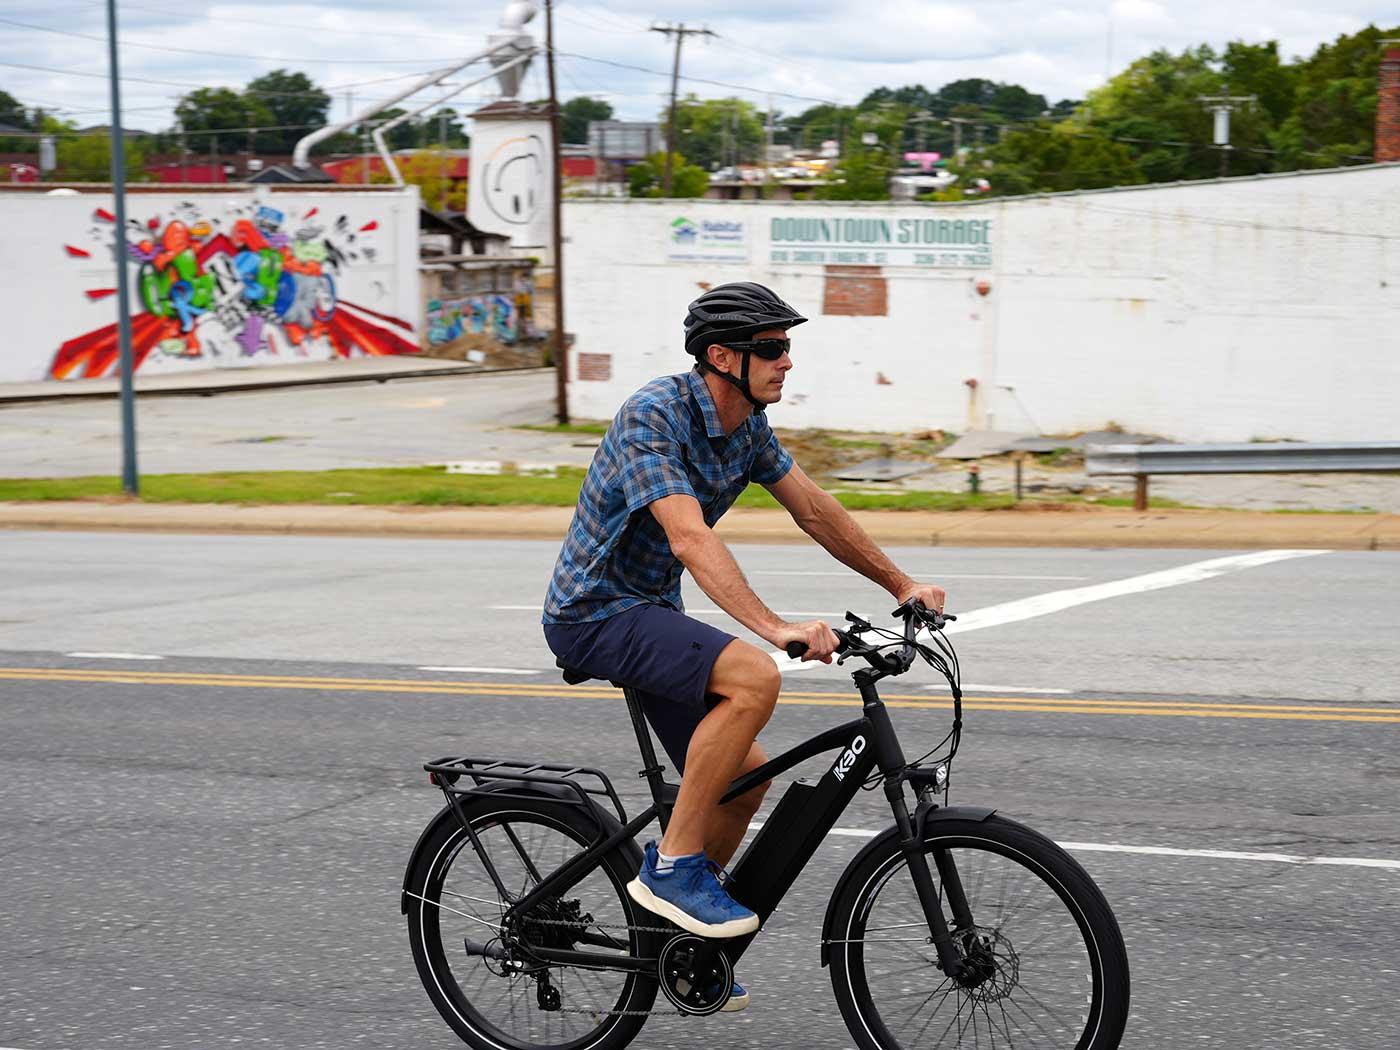 kbo breeze e-bike rider on the streets